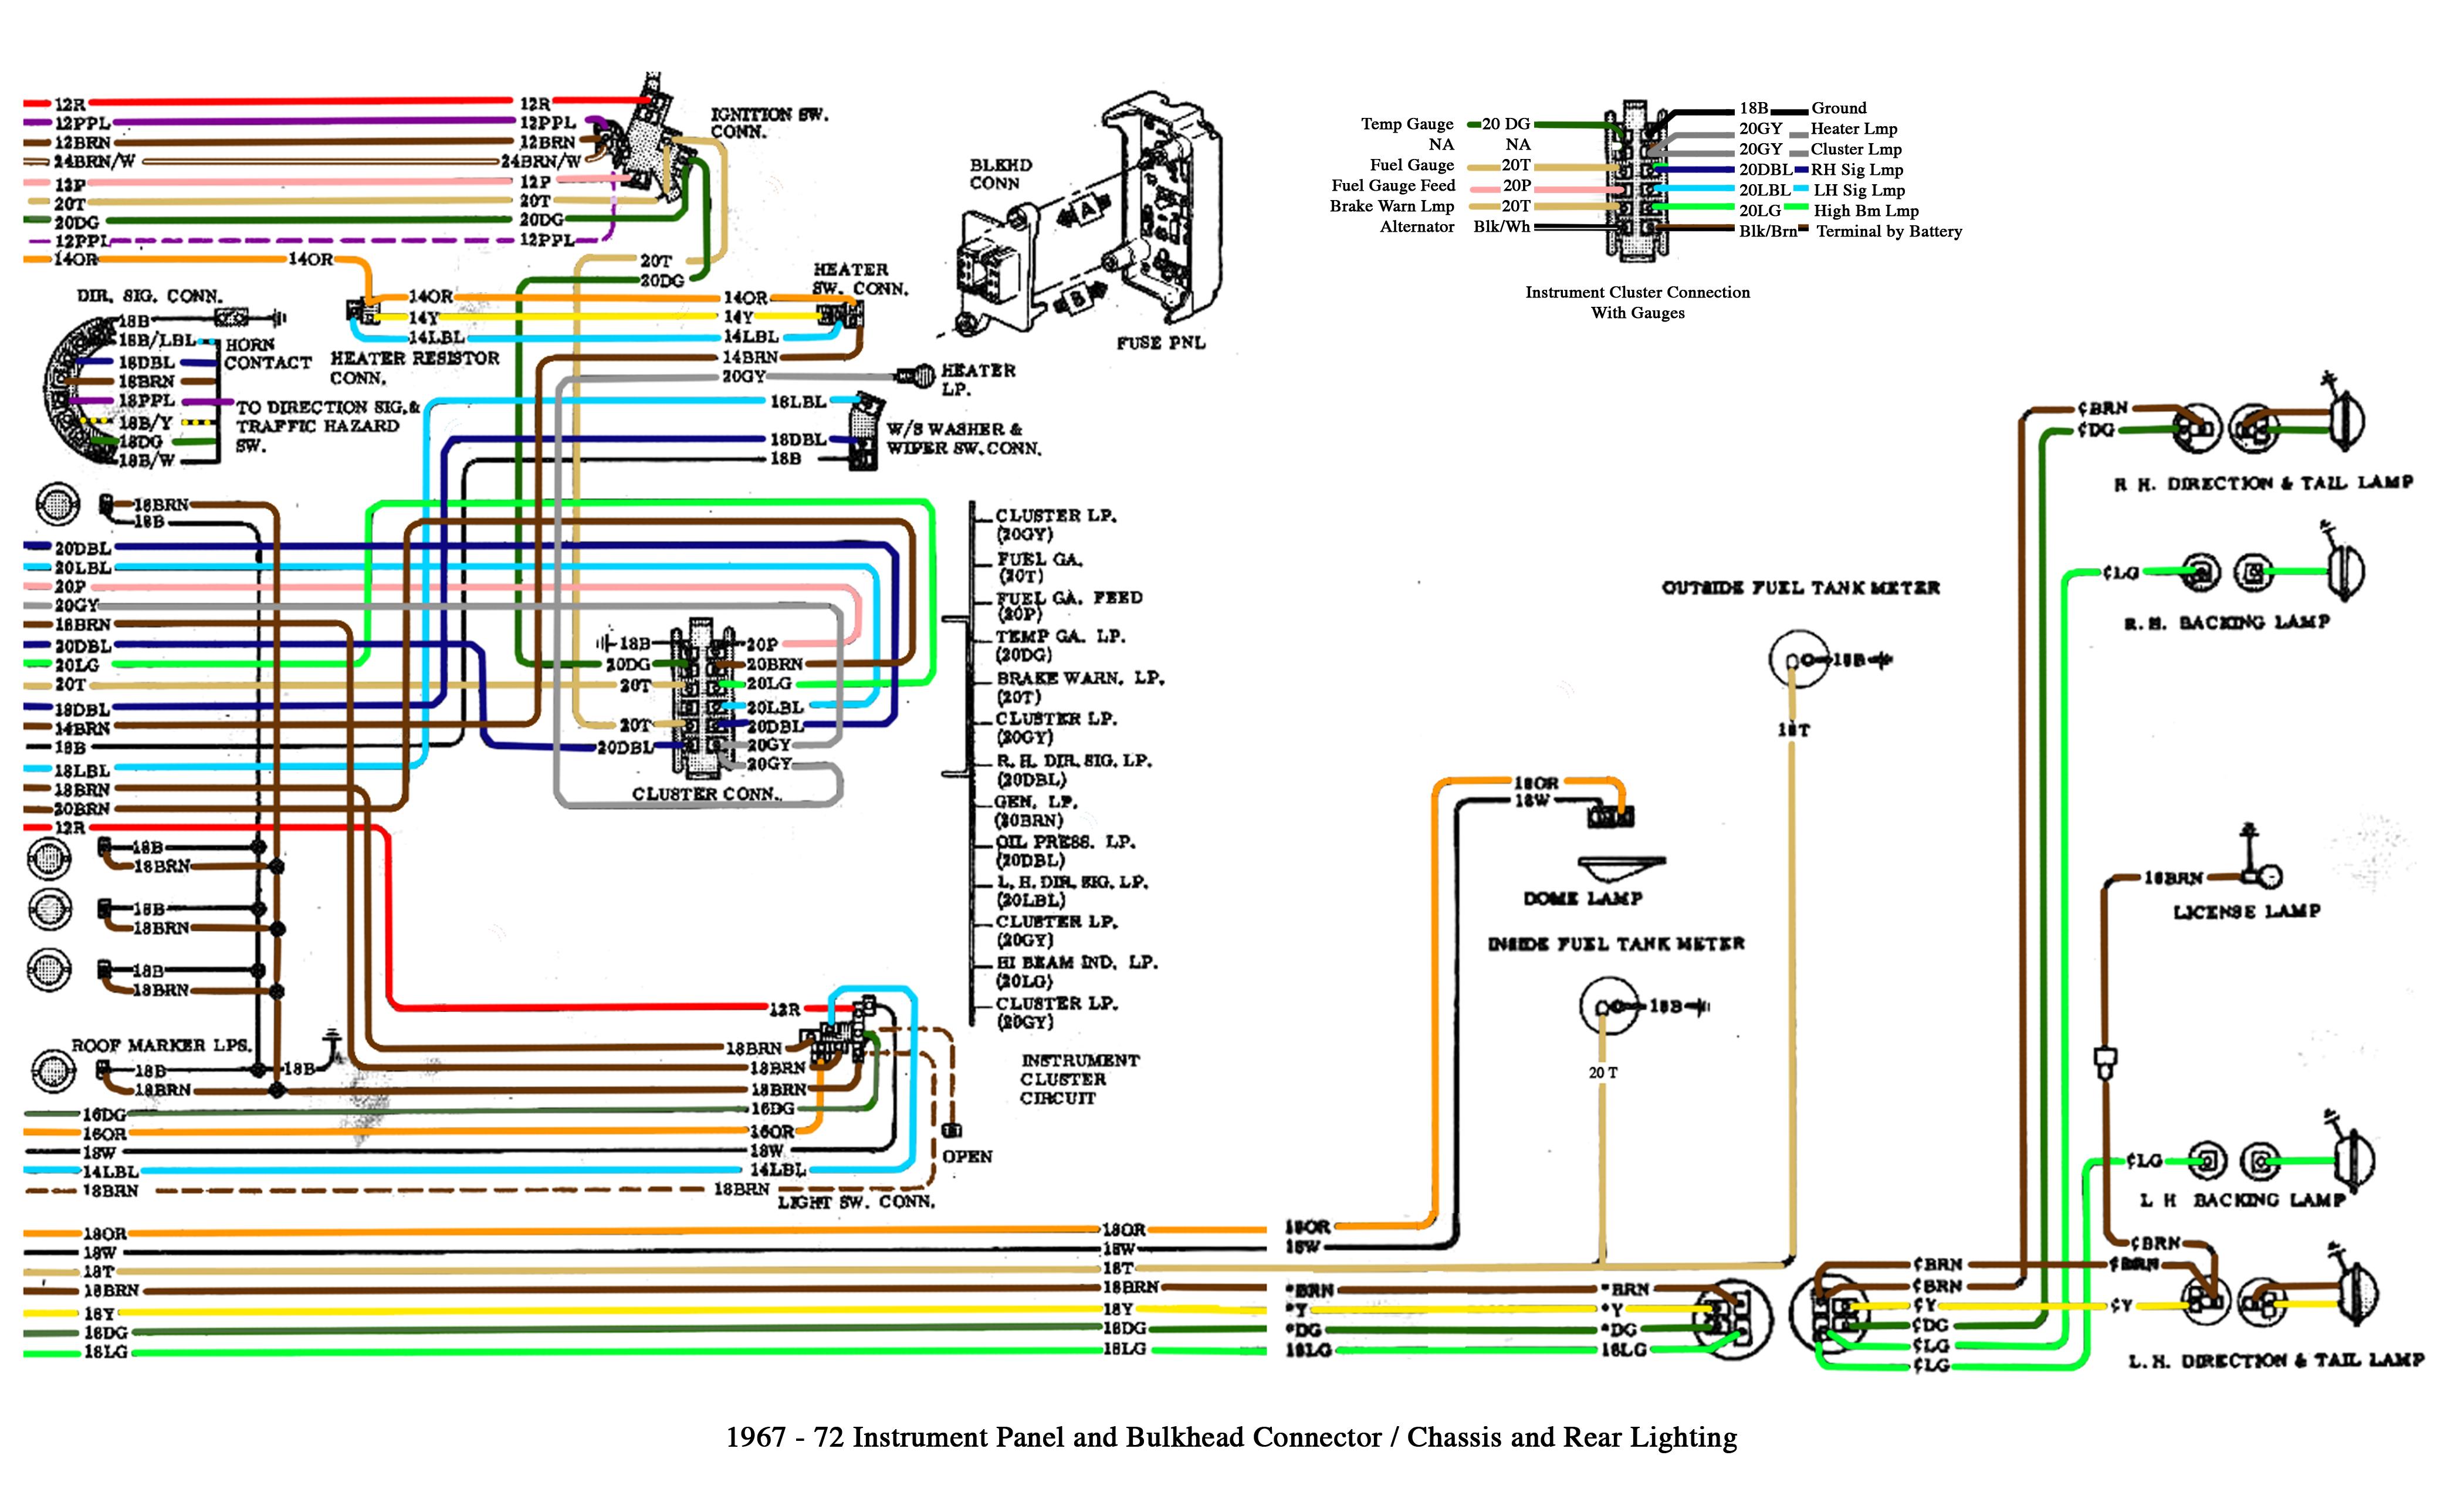 2011 Chevy Silverado 1500 Wiring Diagram | Wiring Diagram - 2008 Chevy Silverado Wiring Diagram